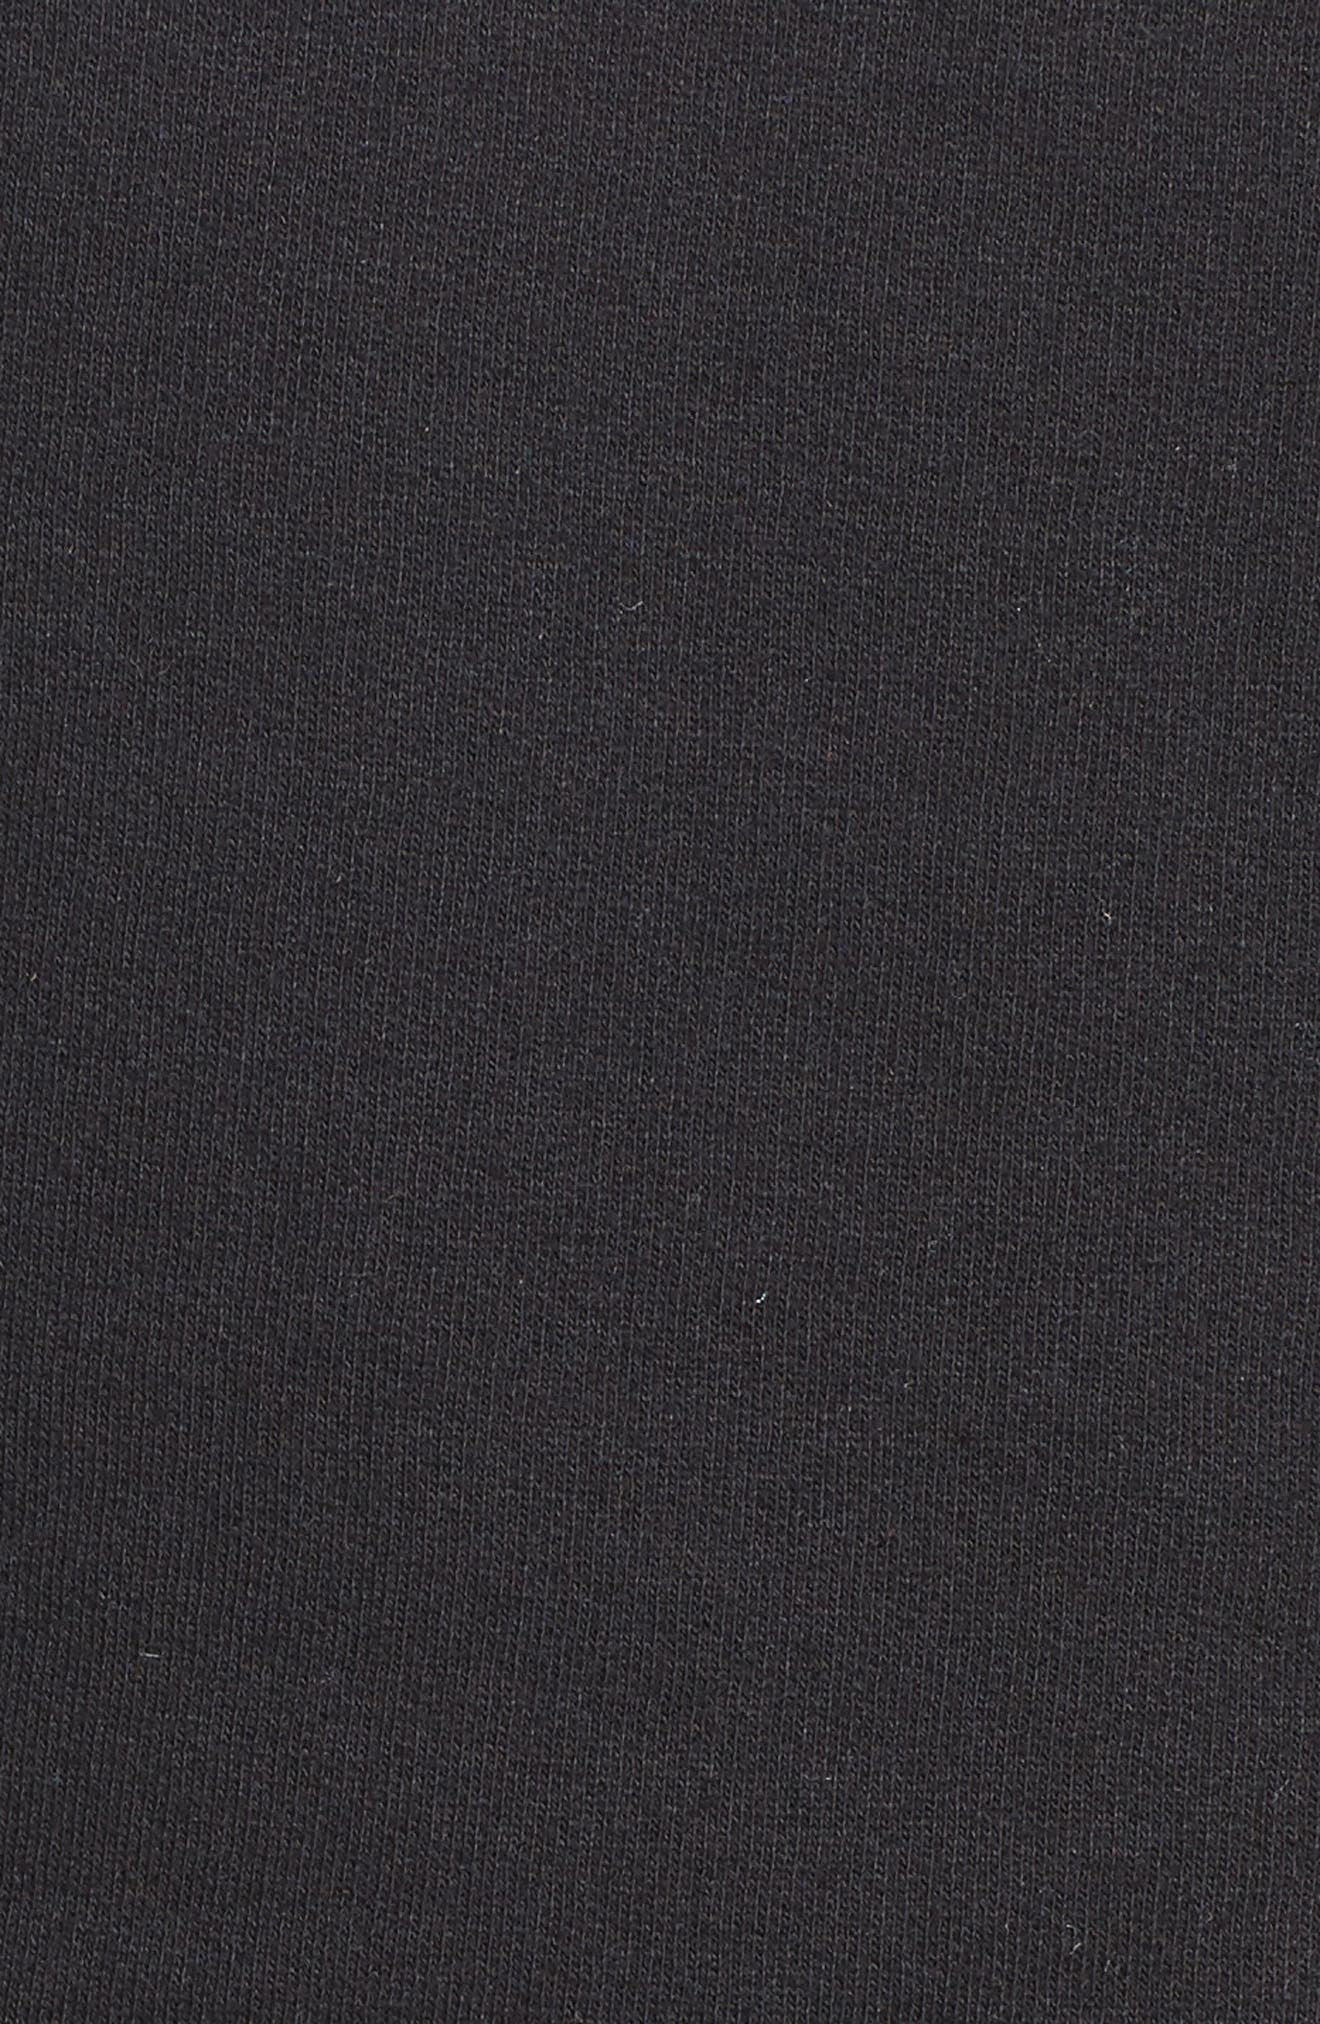 'This Wine' Crewneck Sweatshirt,                             Alternate thumbnail 5, color,                             001